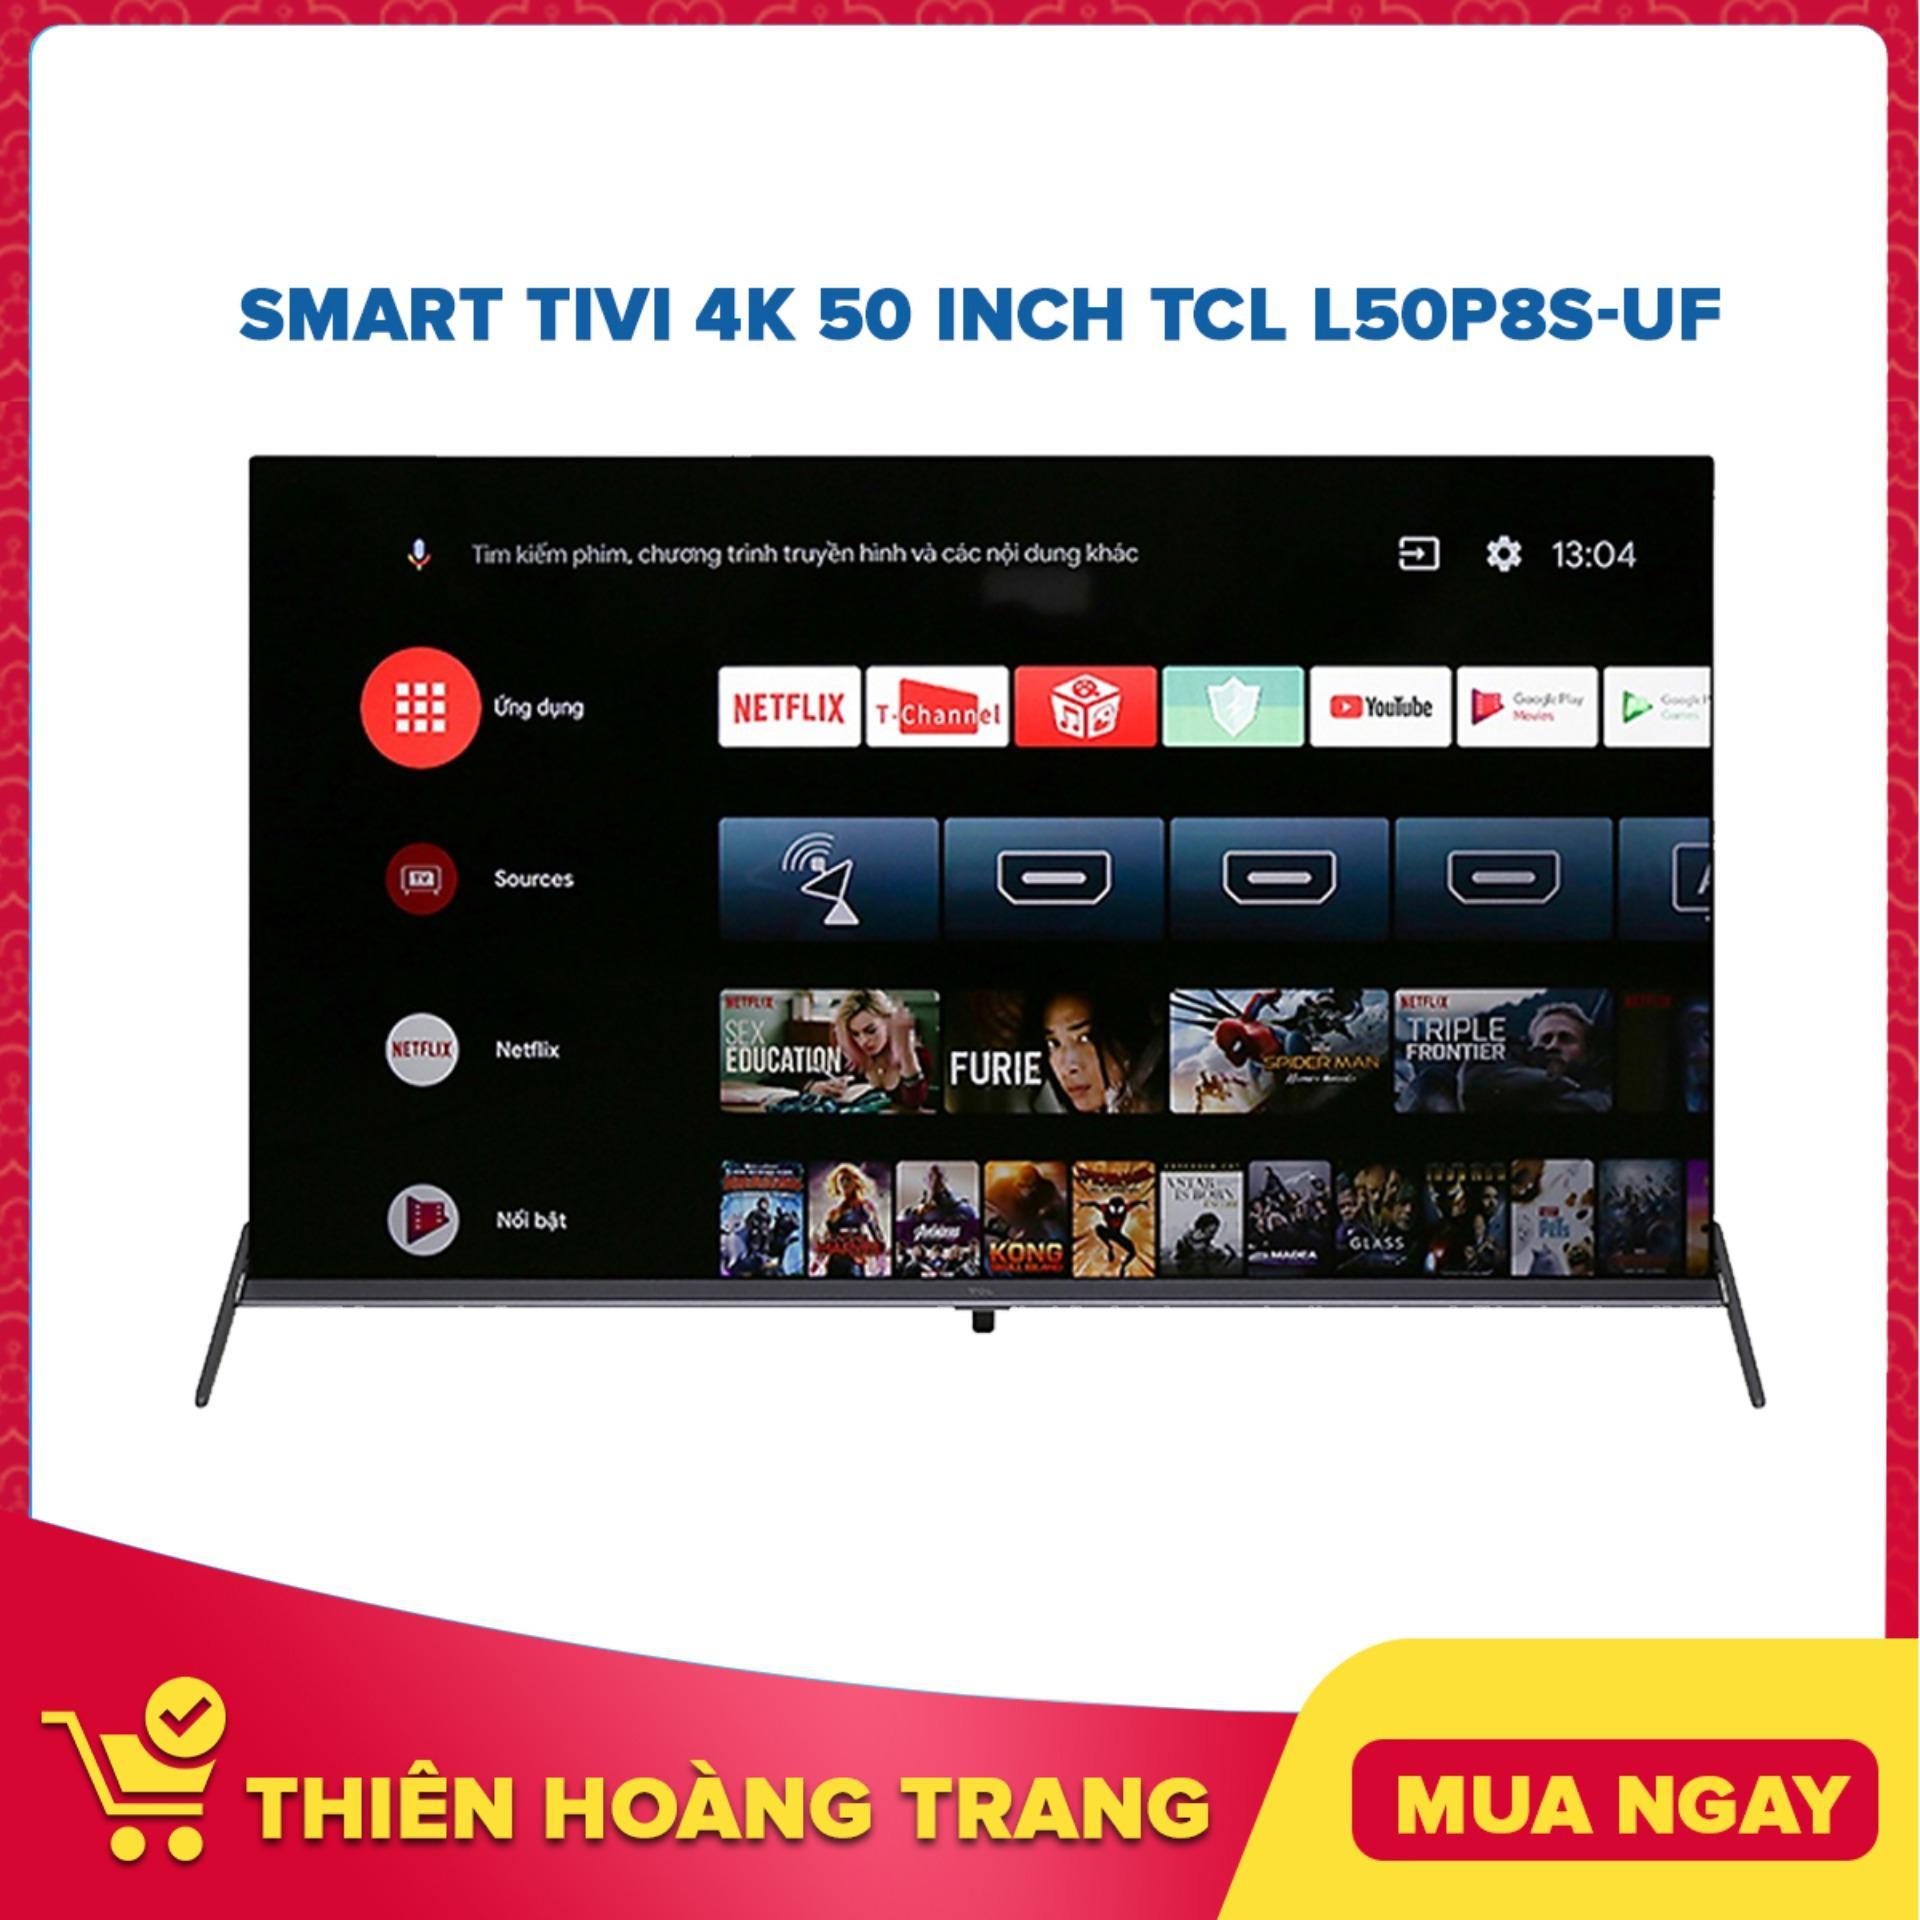 Bảng giá Smart Tivi 4K 50 Inch TCL L50P8S-UF